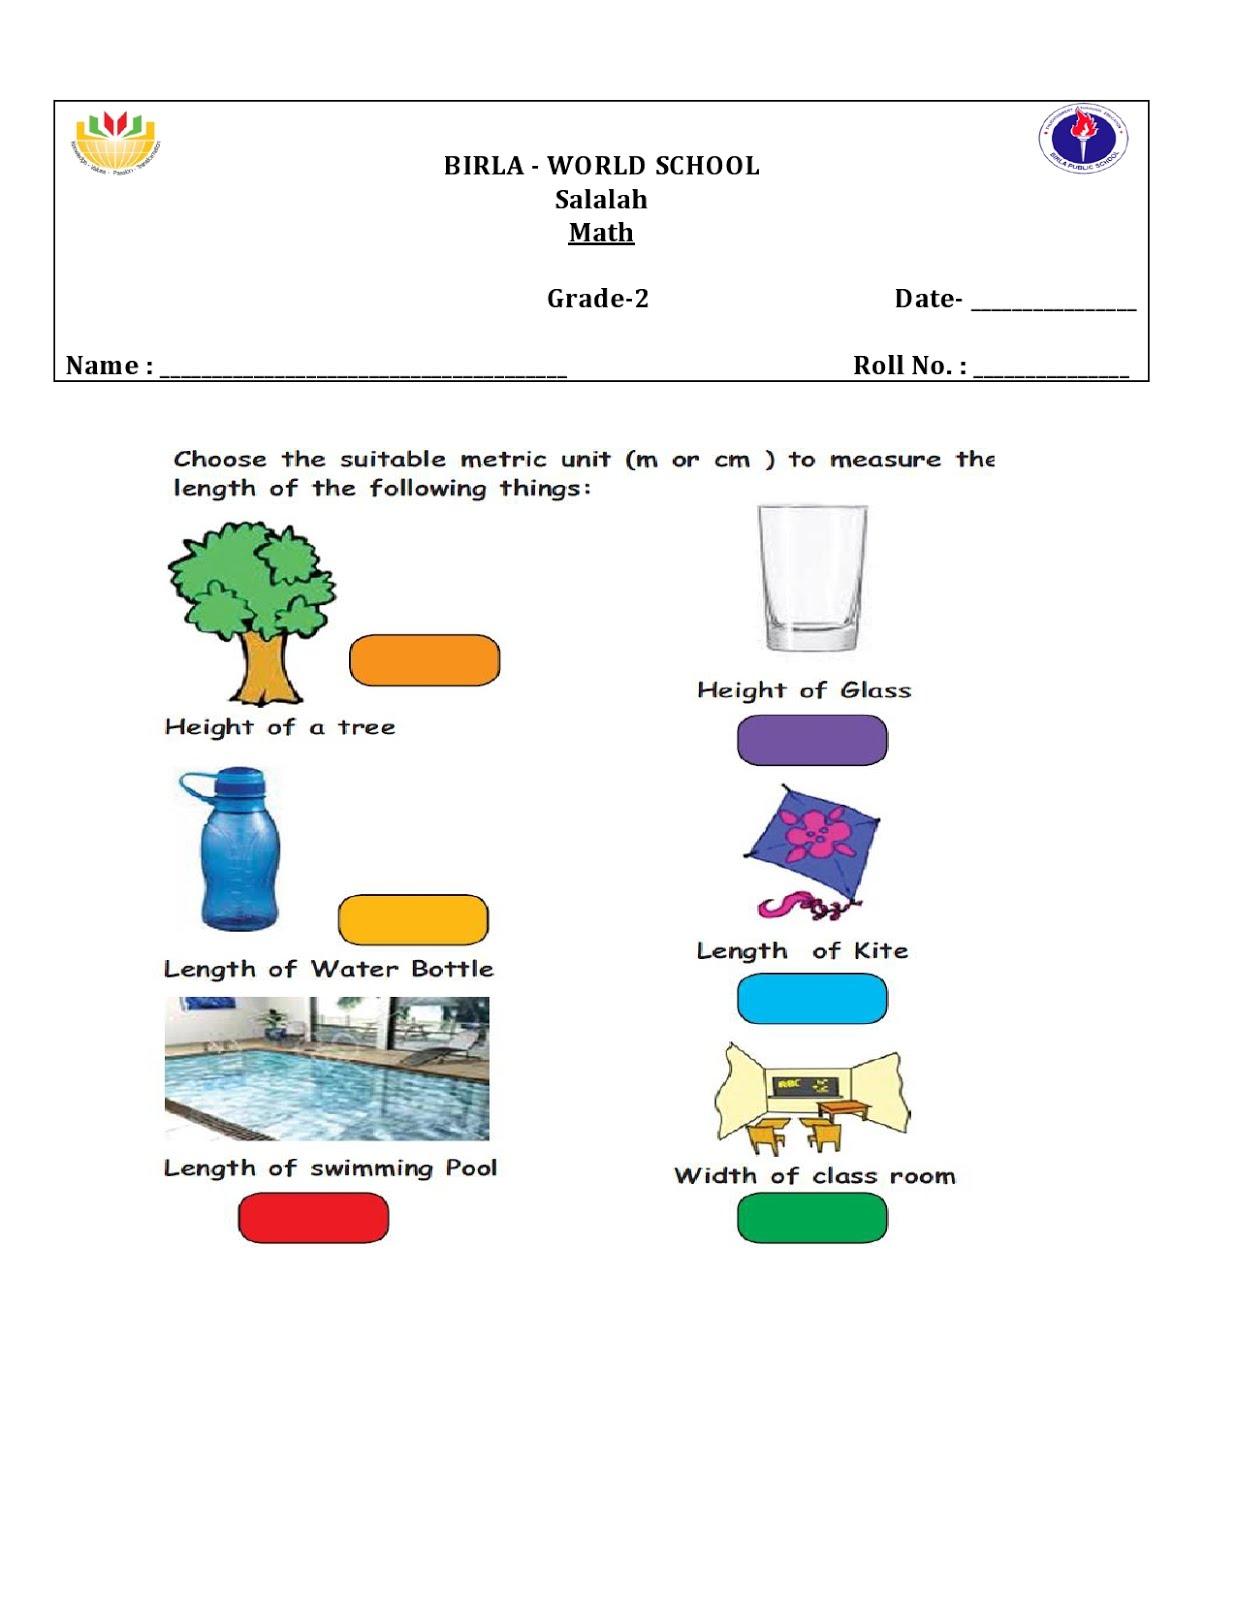 Birla World School Oman Homework For Grade 2b On 14 1 16